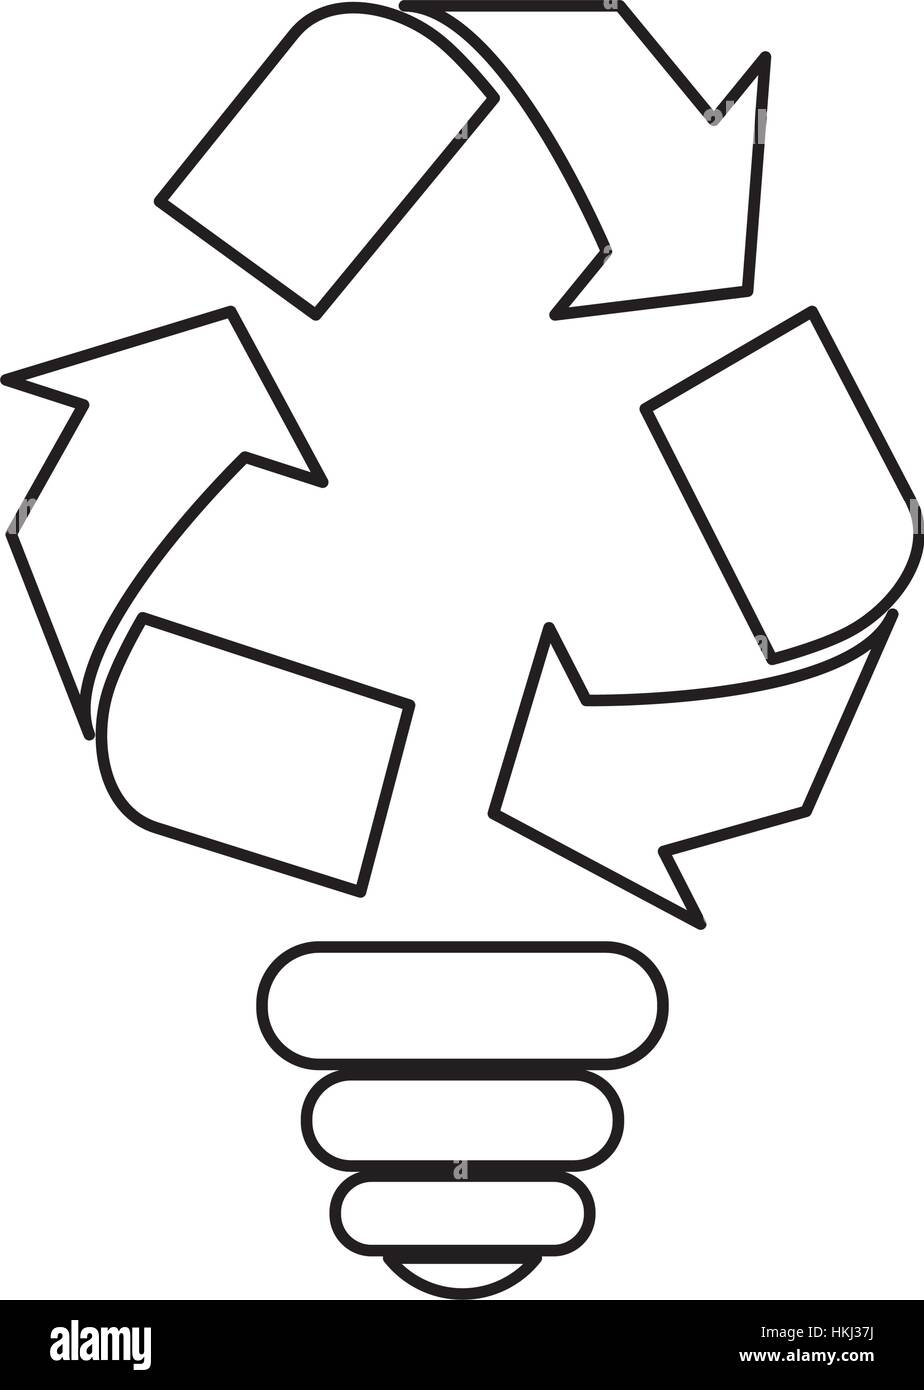 Contour bulb environmental care icon image, vector illustration - Stock Image